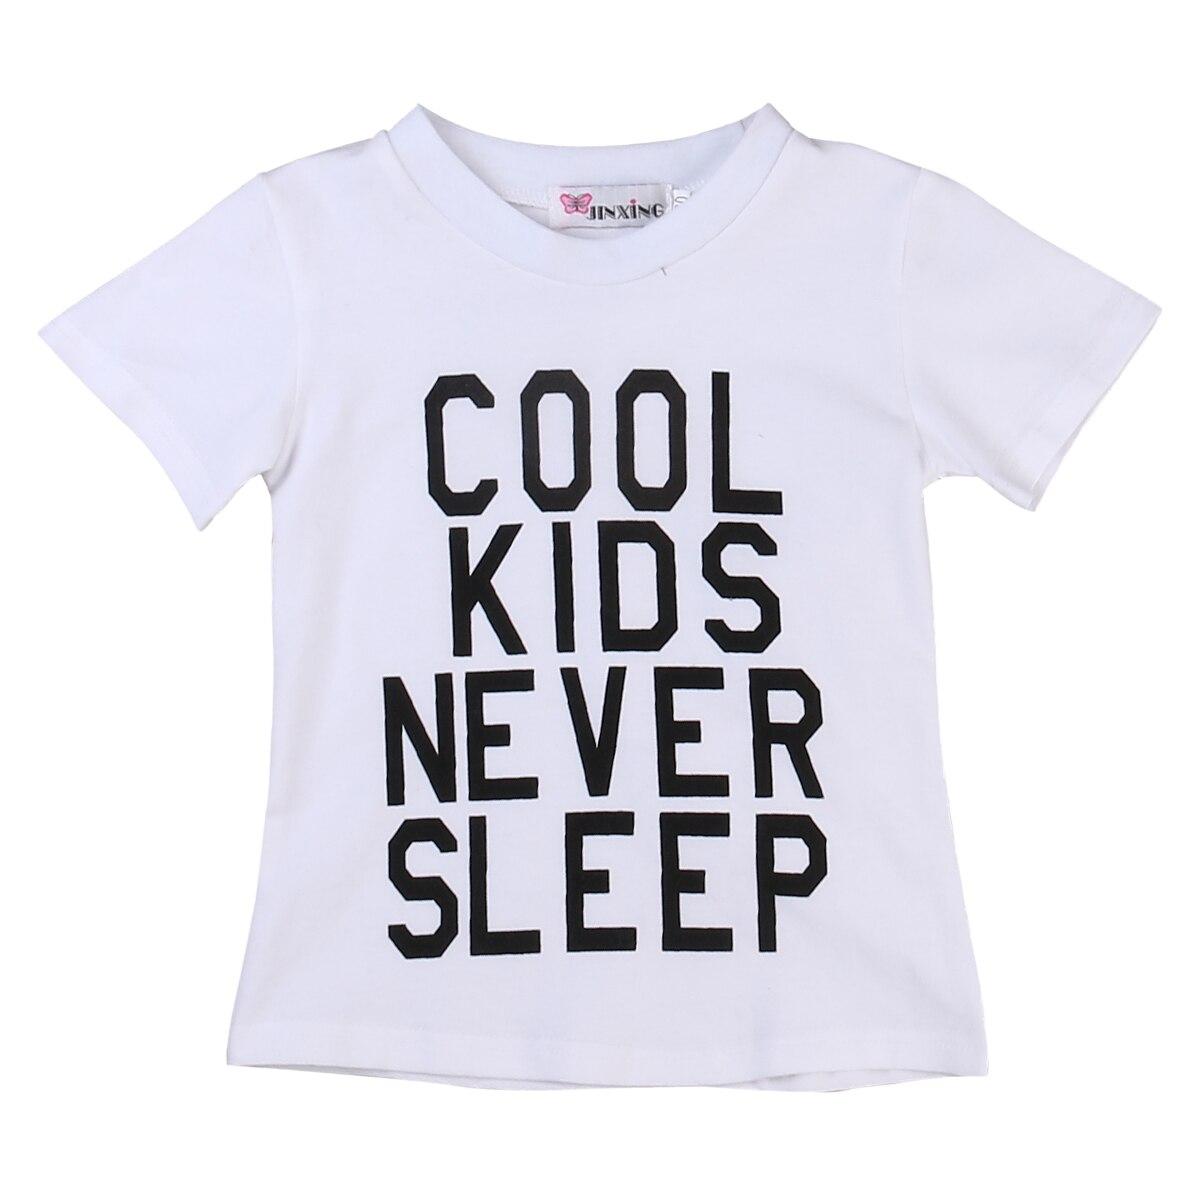 T-Shirt Clothing Short-Sleeve White Kids Boy Cotton Children's Summer Letter 1-6Y Tee